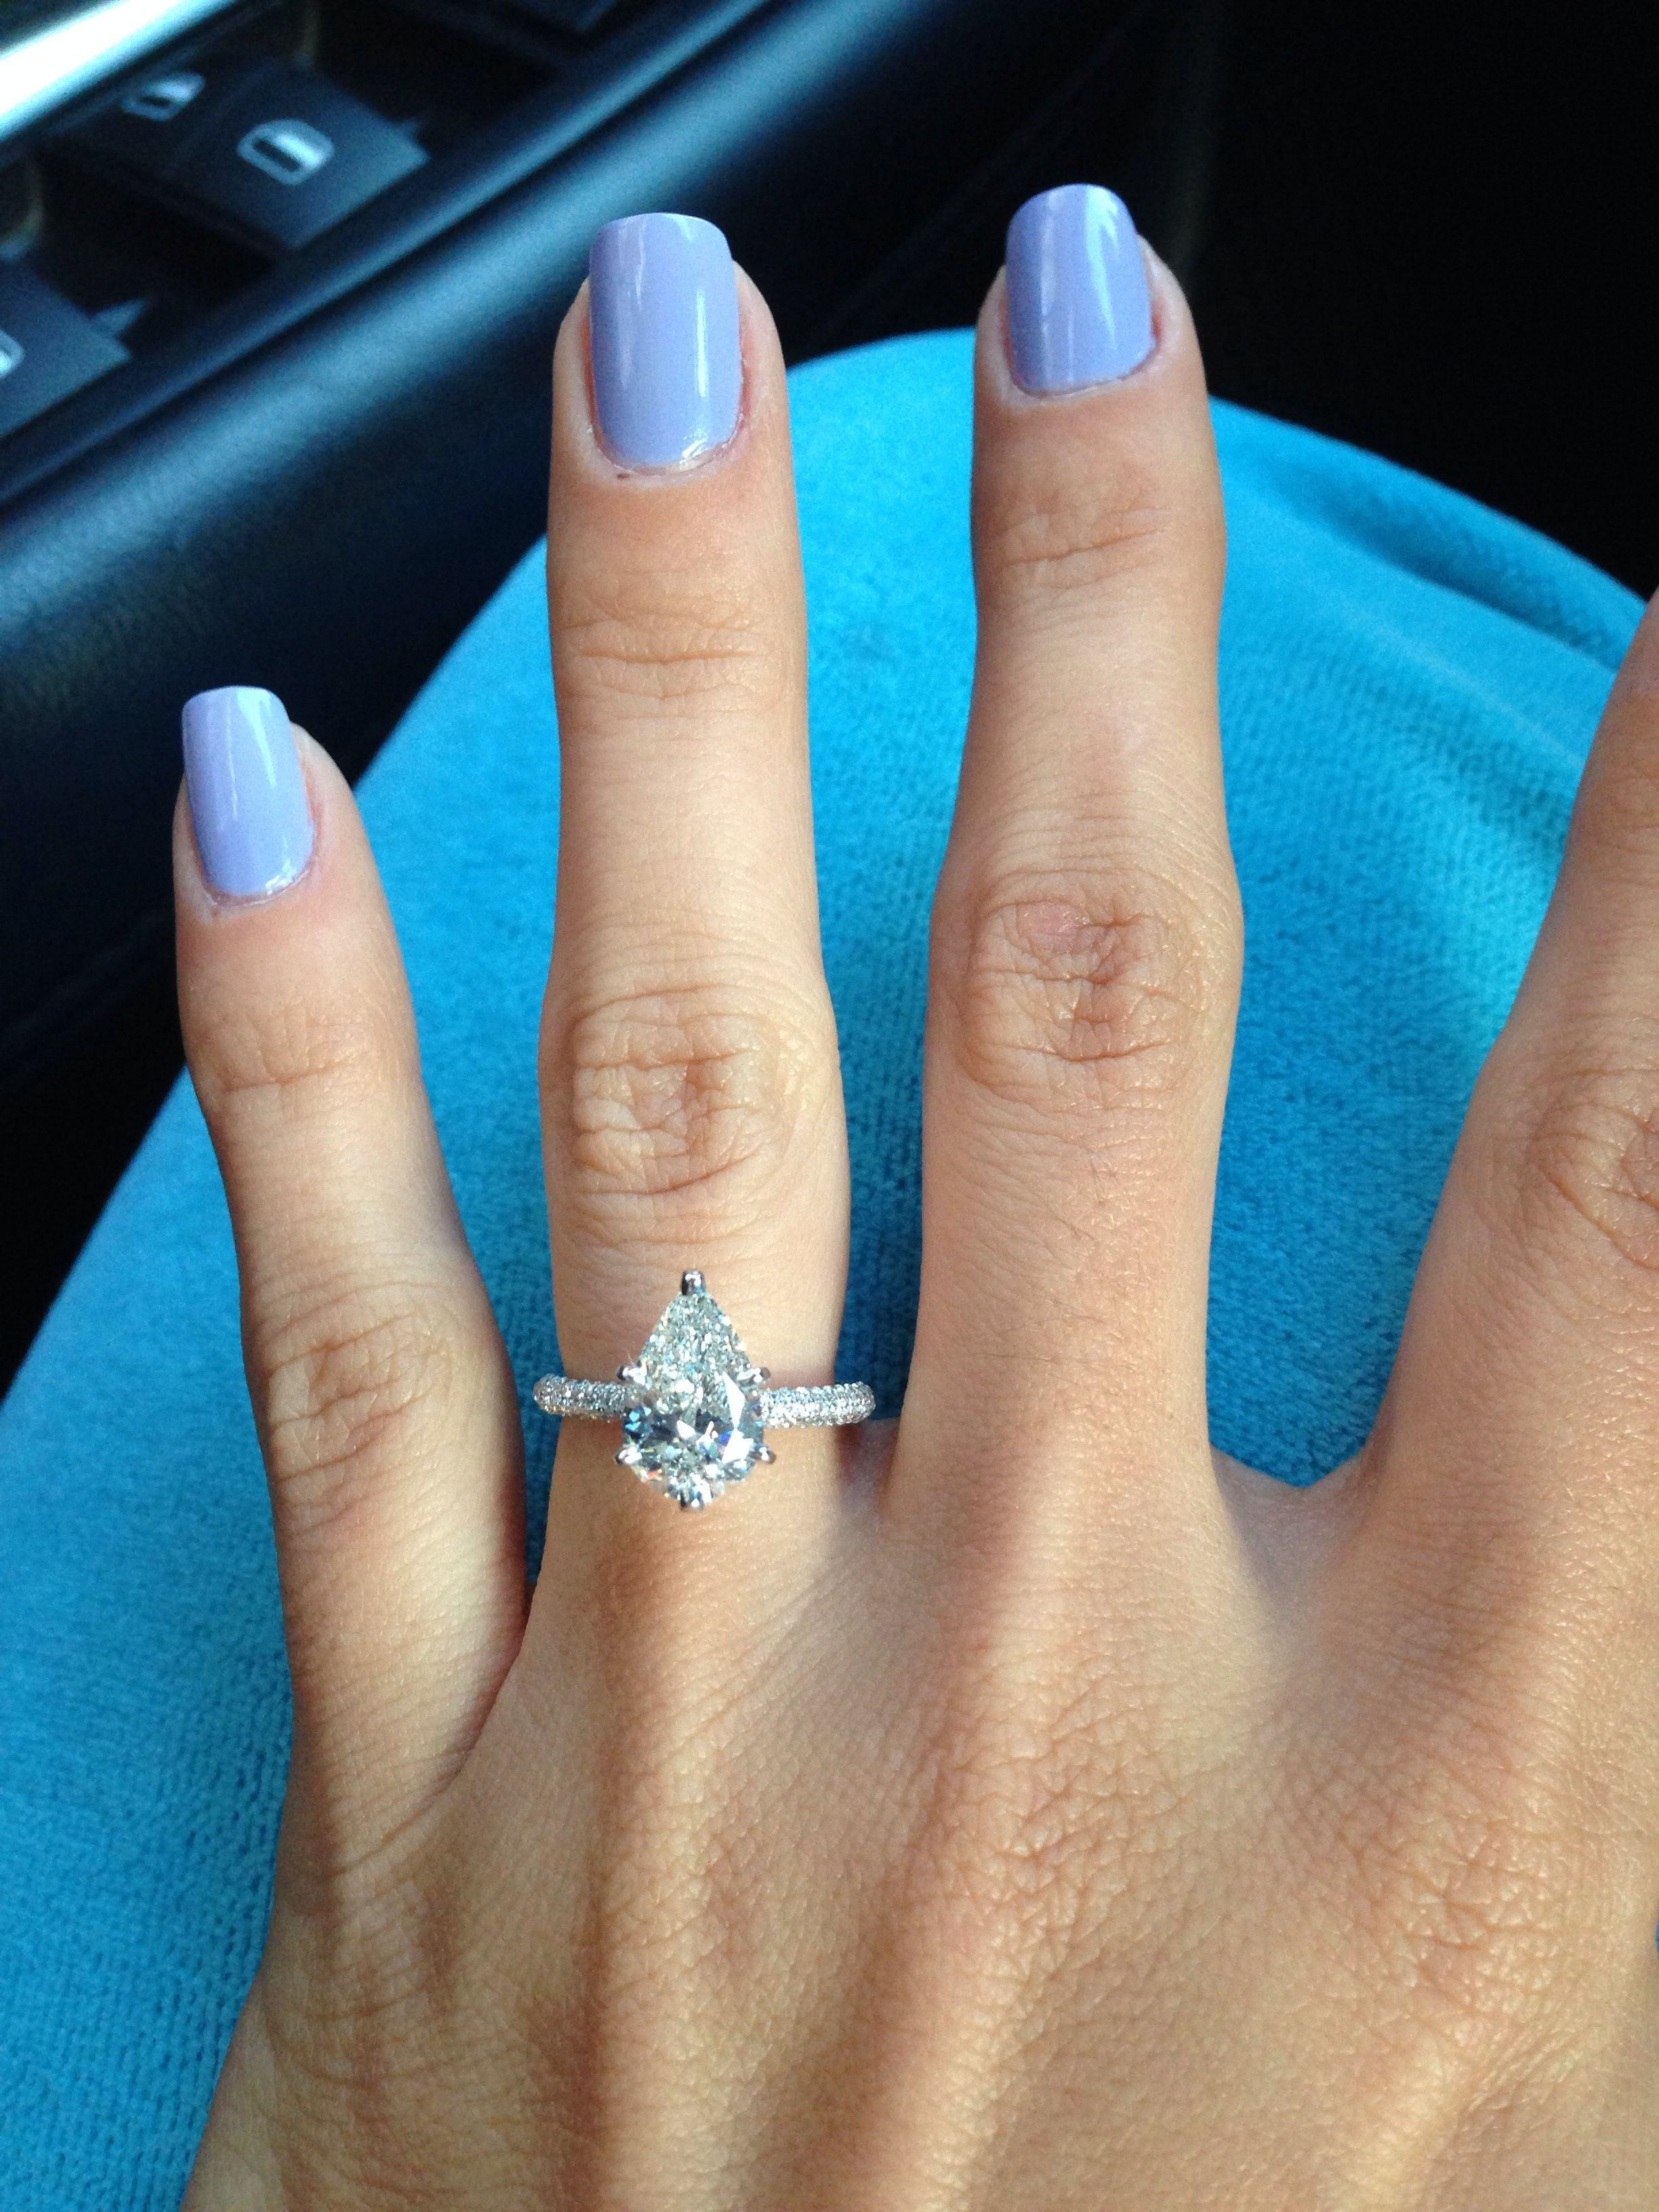 Let 039 S See Your Pear Diamond Rings Weddingbee Engagement Ring Shapes Pear Diamond Rings Unique Engagement Rings